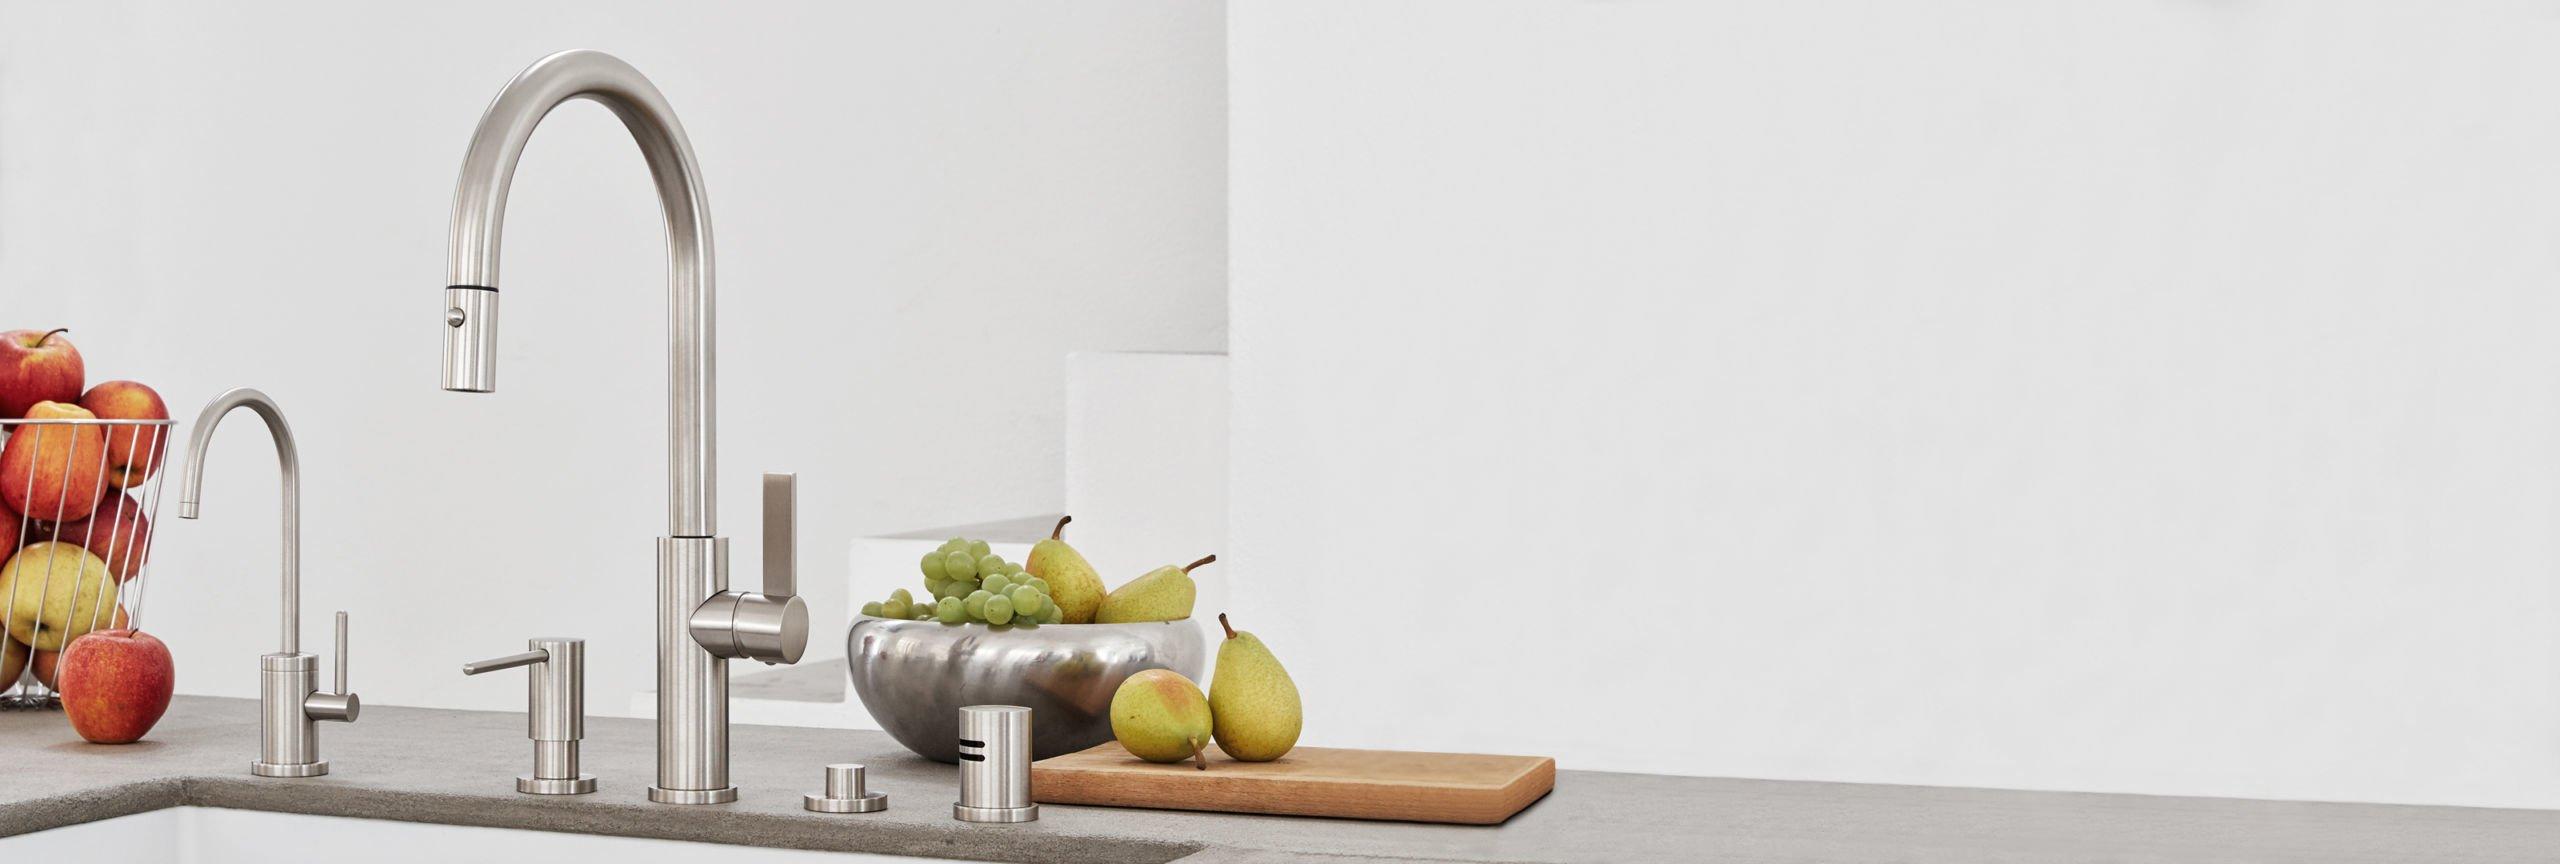 kitchen series corsano faucet, water spout, soap dispenser, and trim accessories